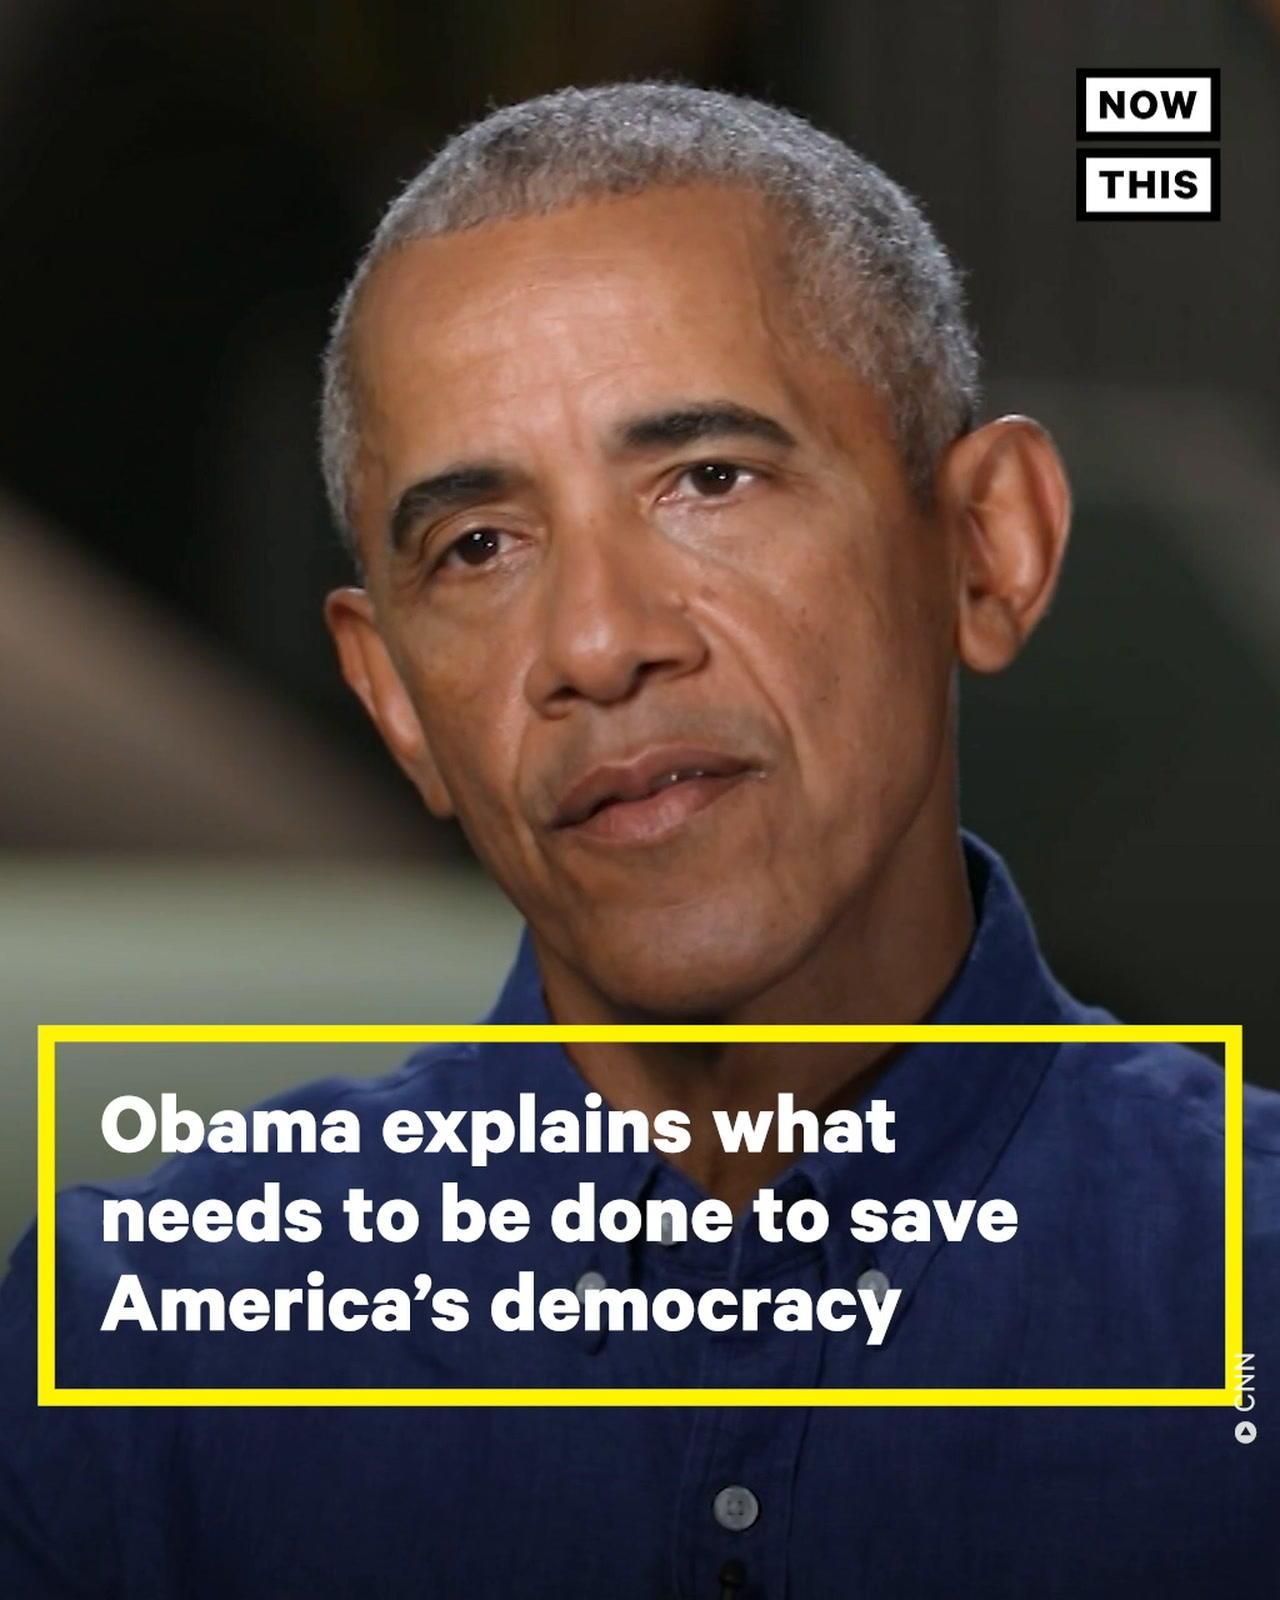 Barack Obama Speaks About Saving America's Democracy